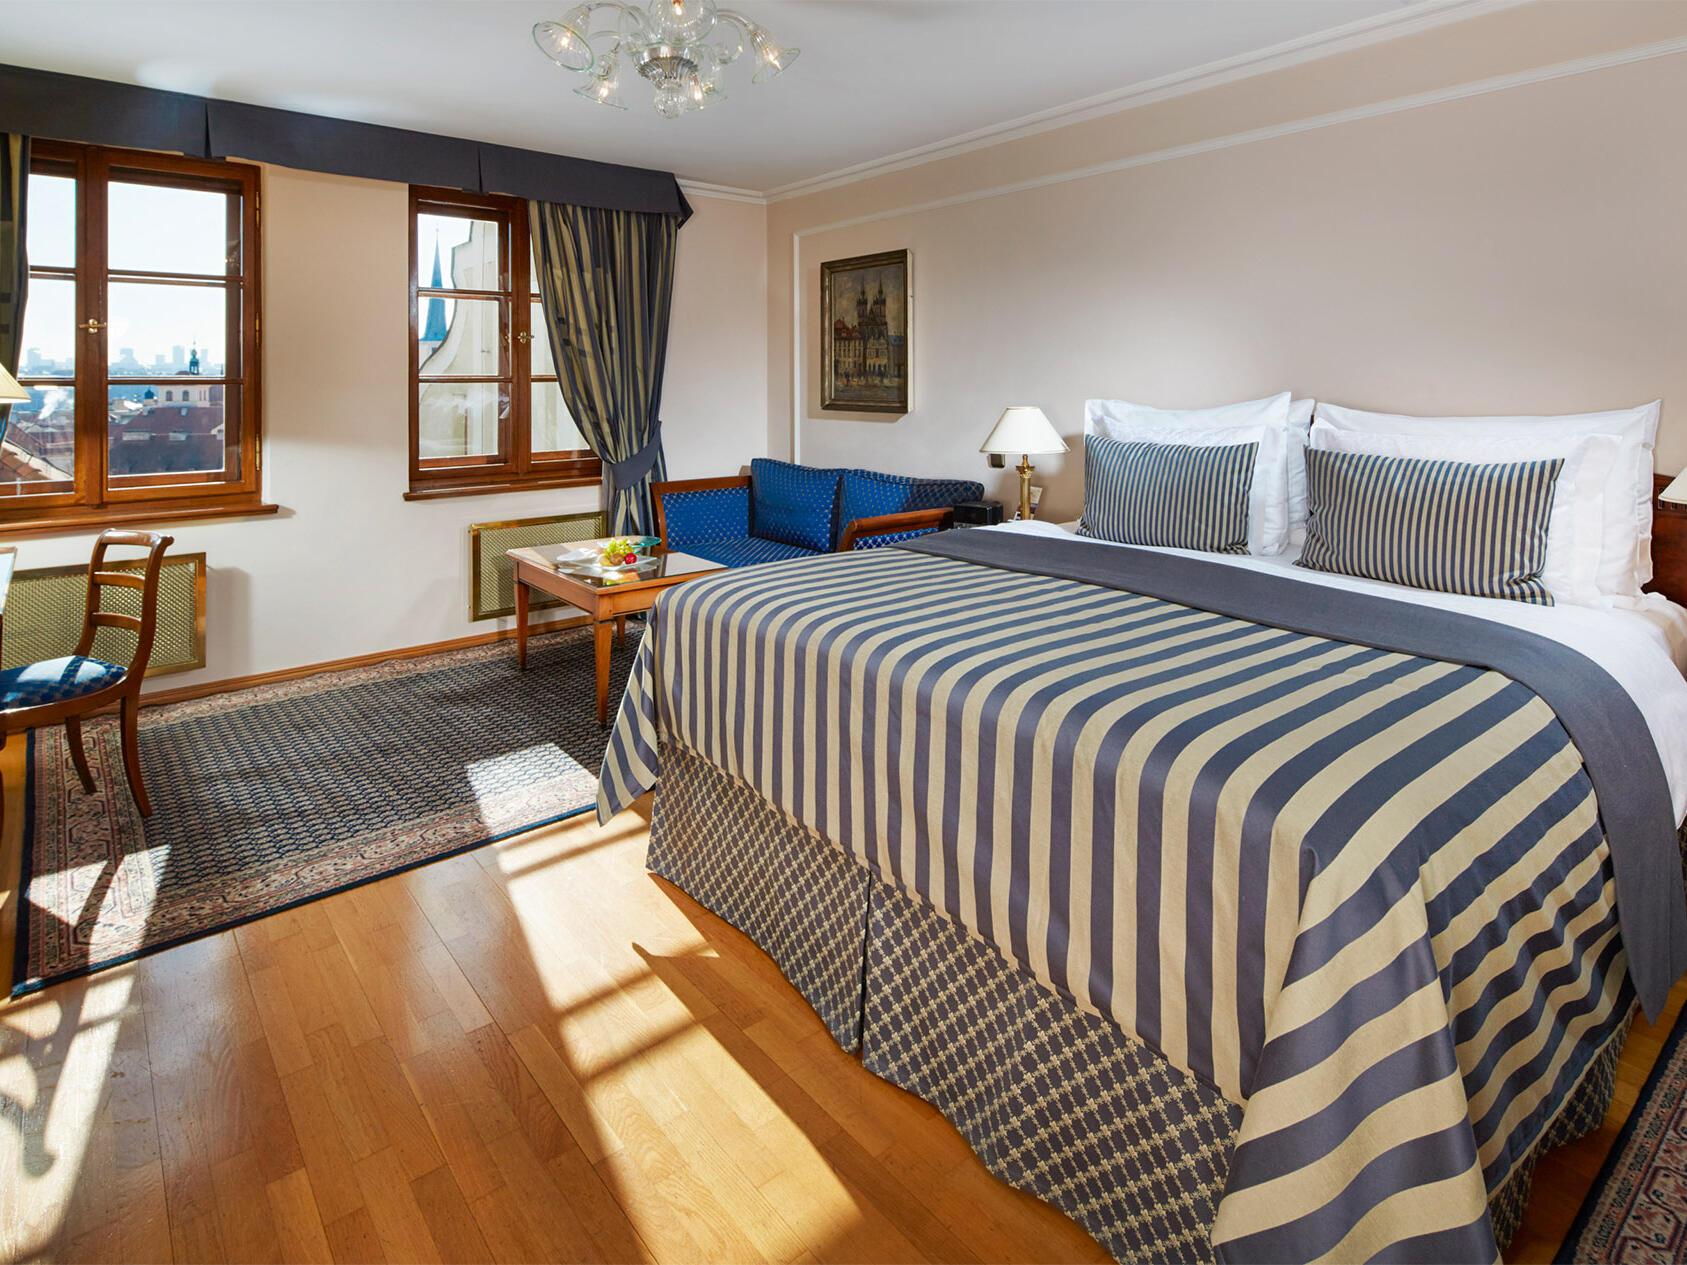 Grand Deluxe Room at Golden Well Hotel in Prague